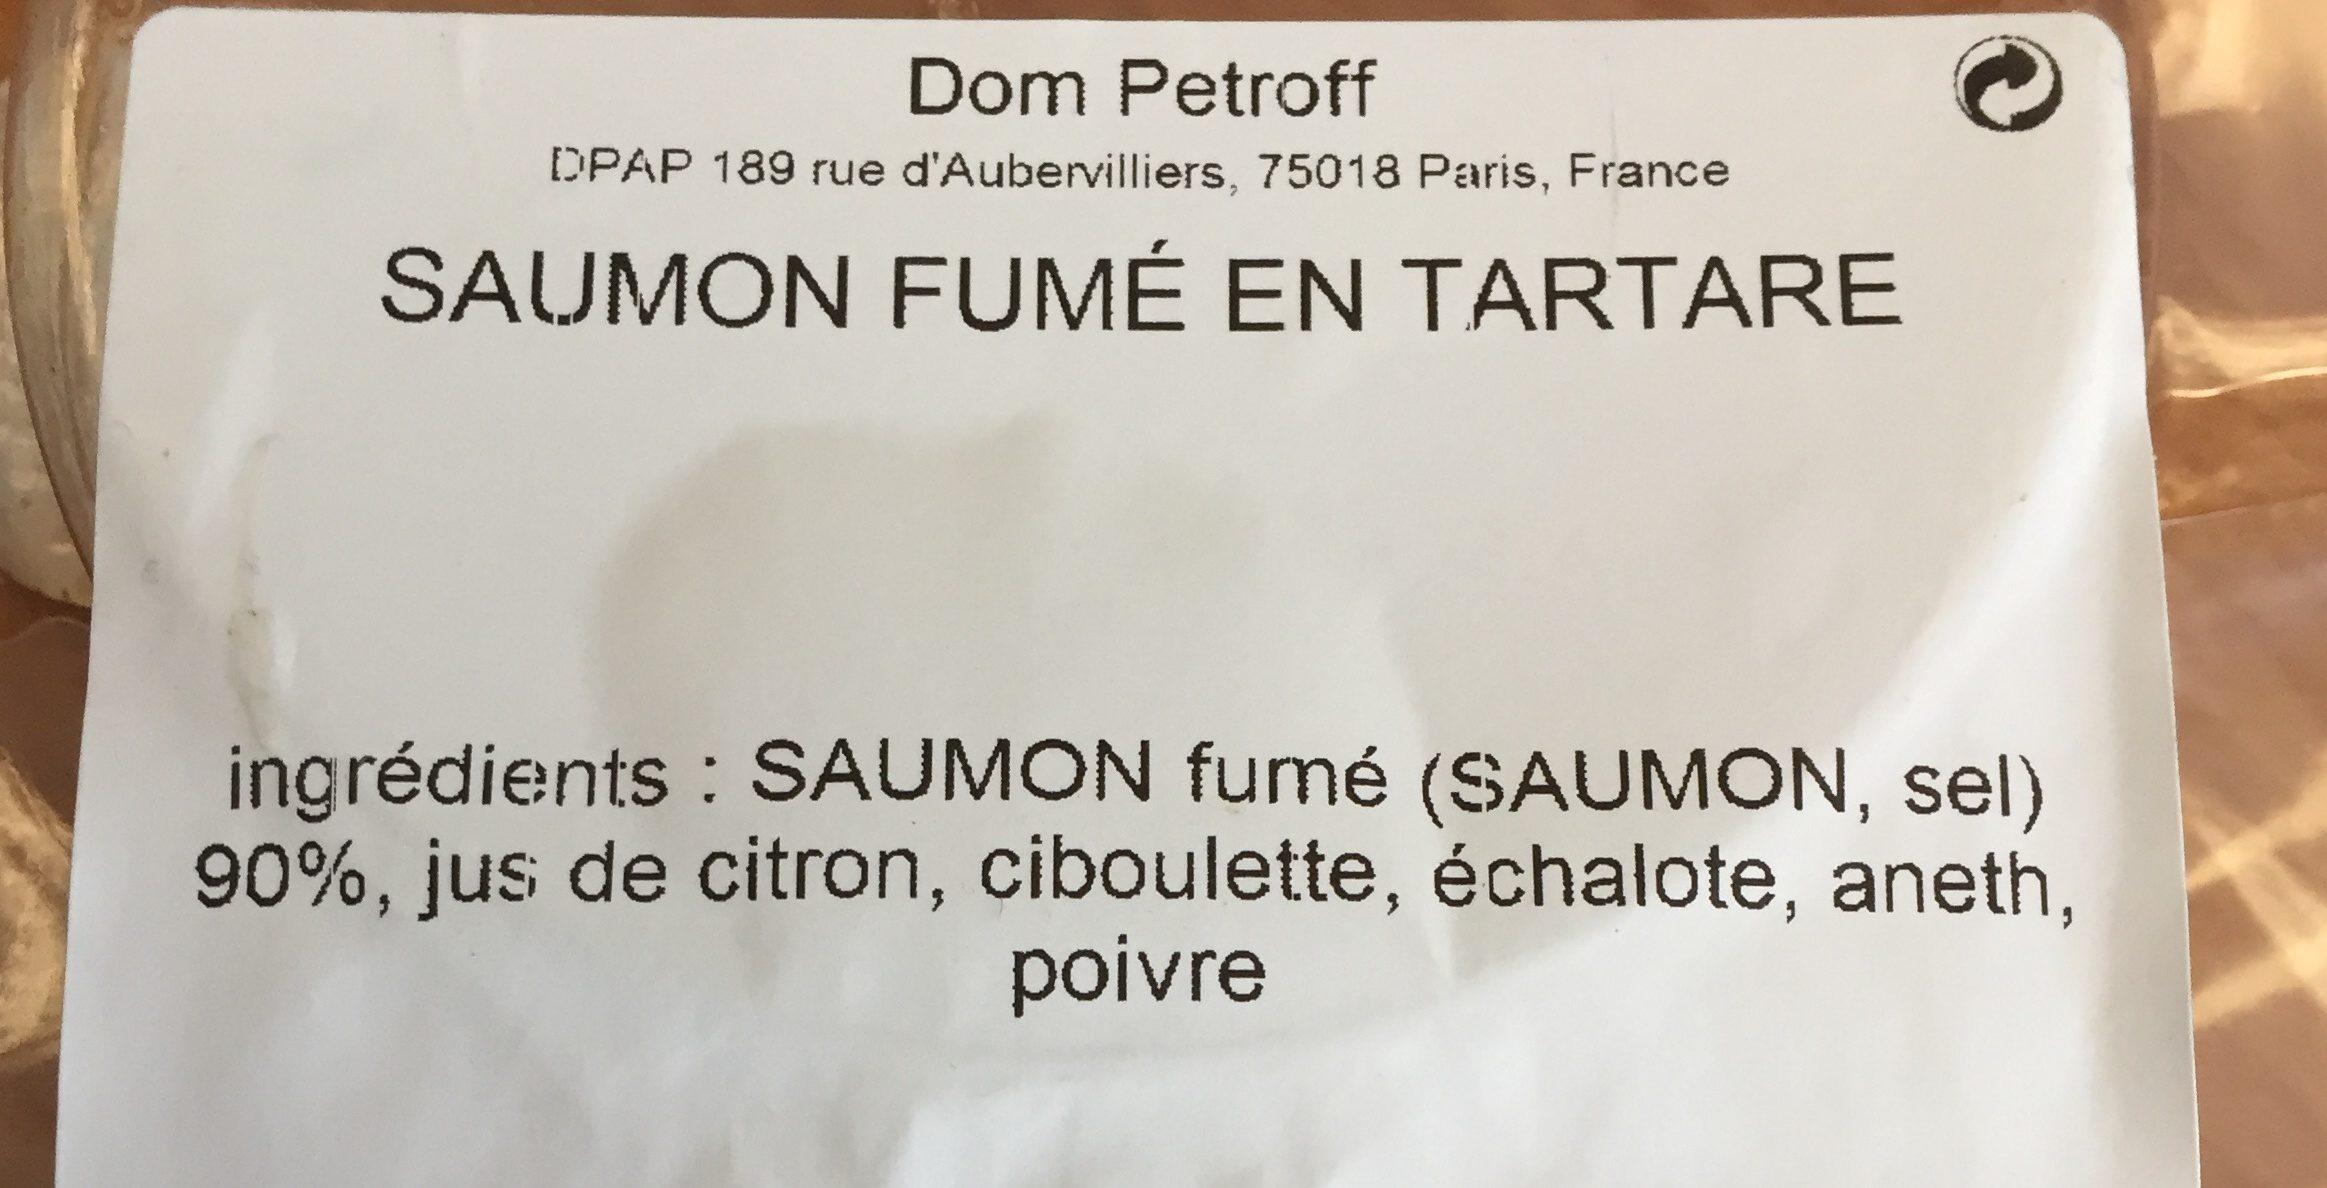 Saumon fumé en tartare - Ingredients - fr